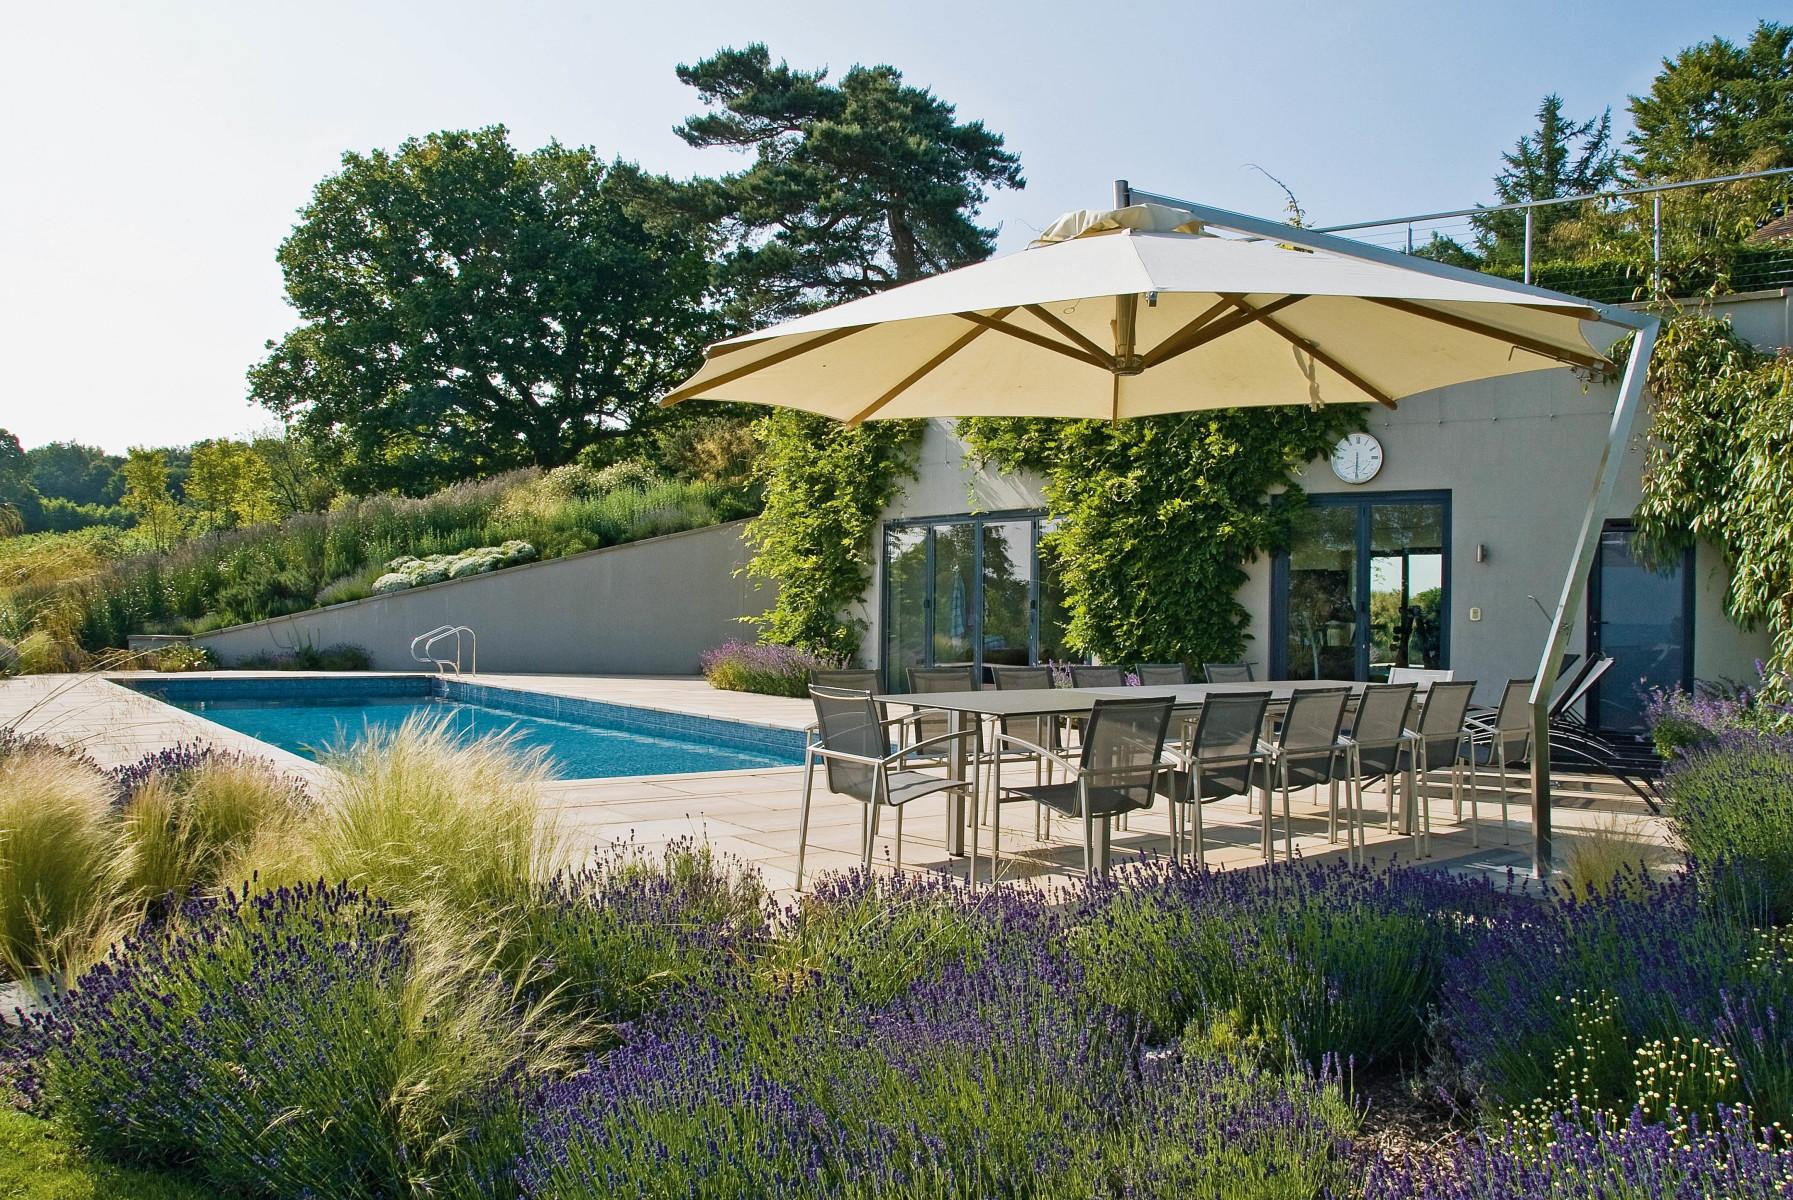 gartendesign mit pool villengarten mit pool im. Black Bedroom Furniture Sets. Home Design Ideas